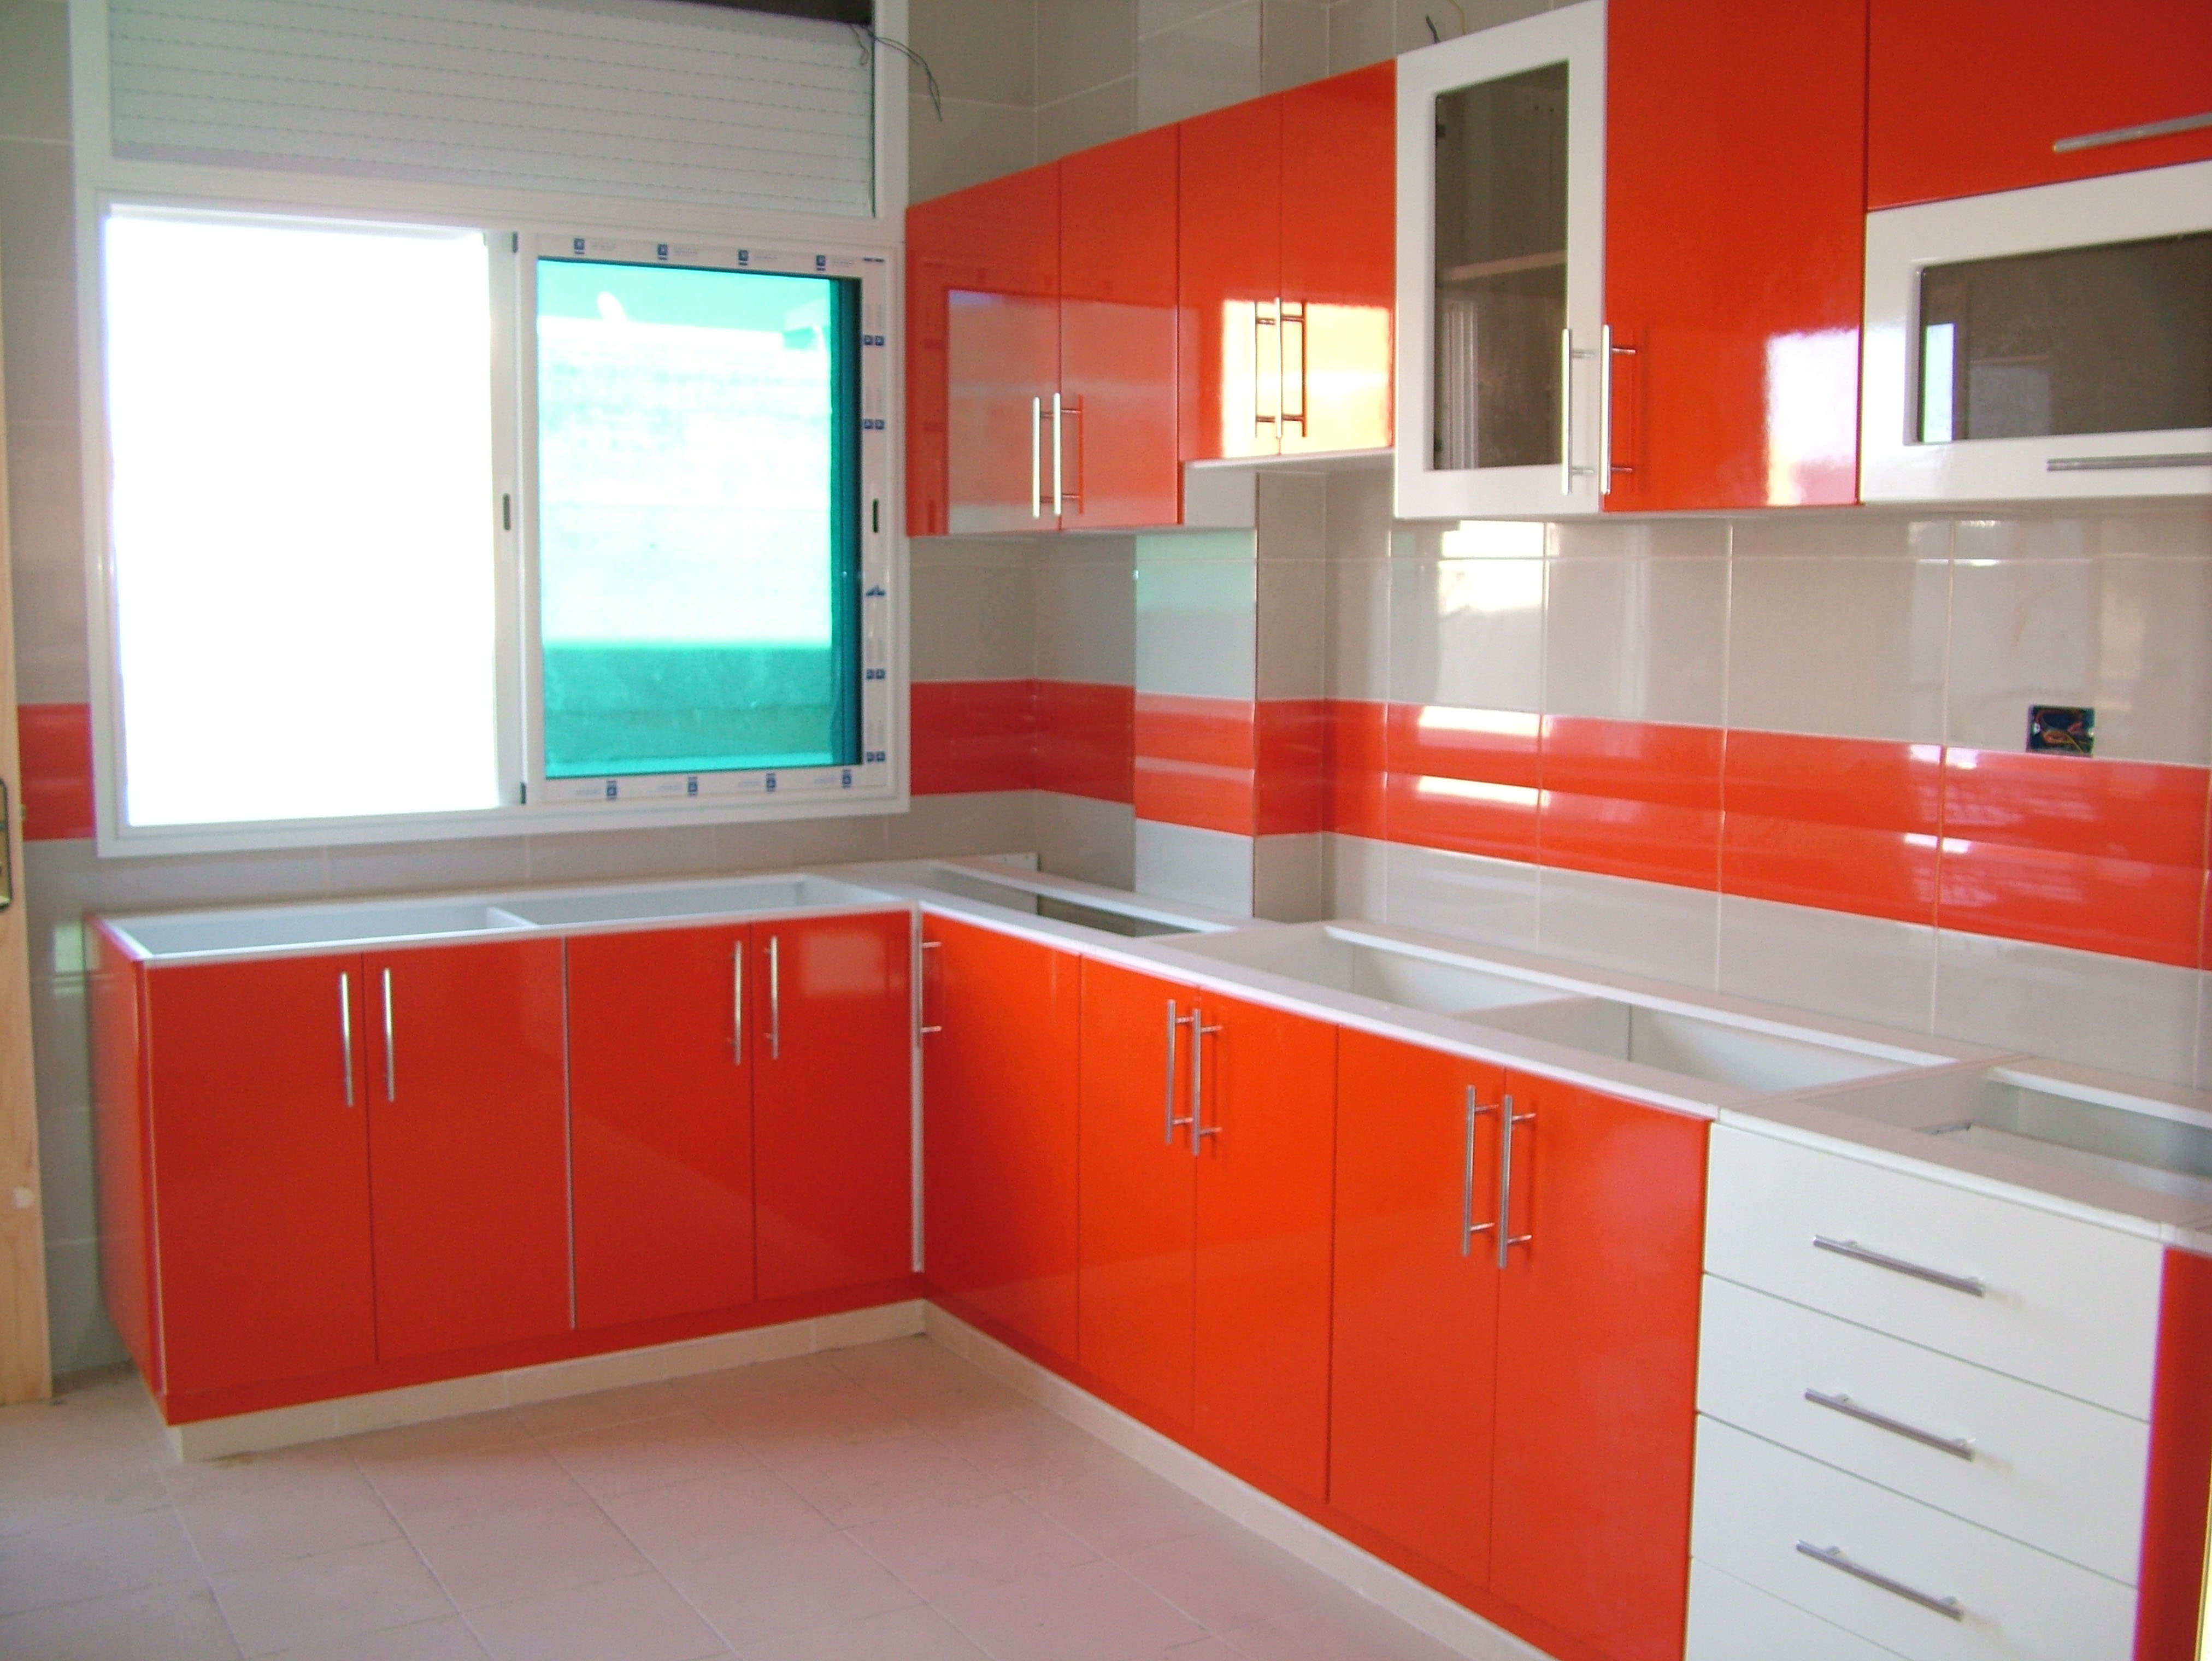 model de cuisine quipe cuisine equipee avec ilot central u2013 limoges 12 u2013 velux. Black Bedroom Furniture Sets. Home Design Ideas